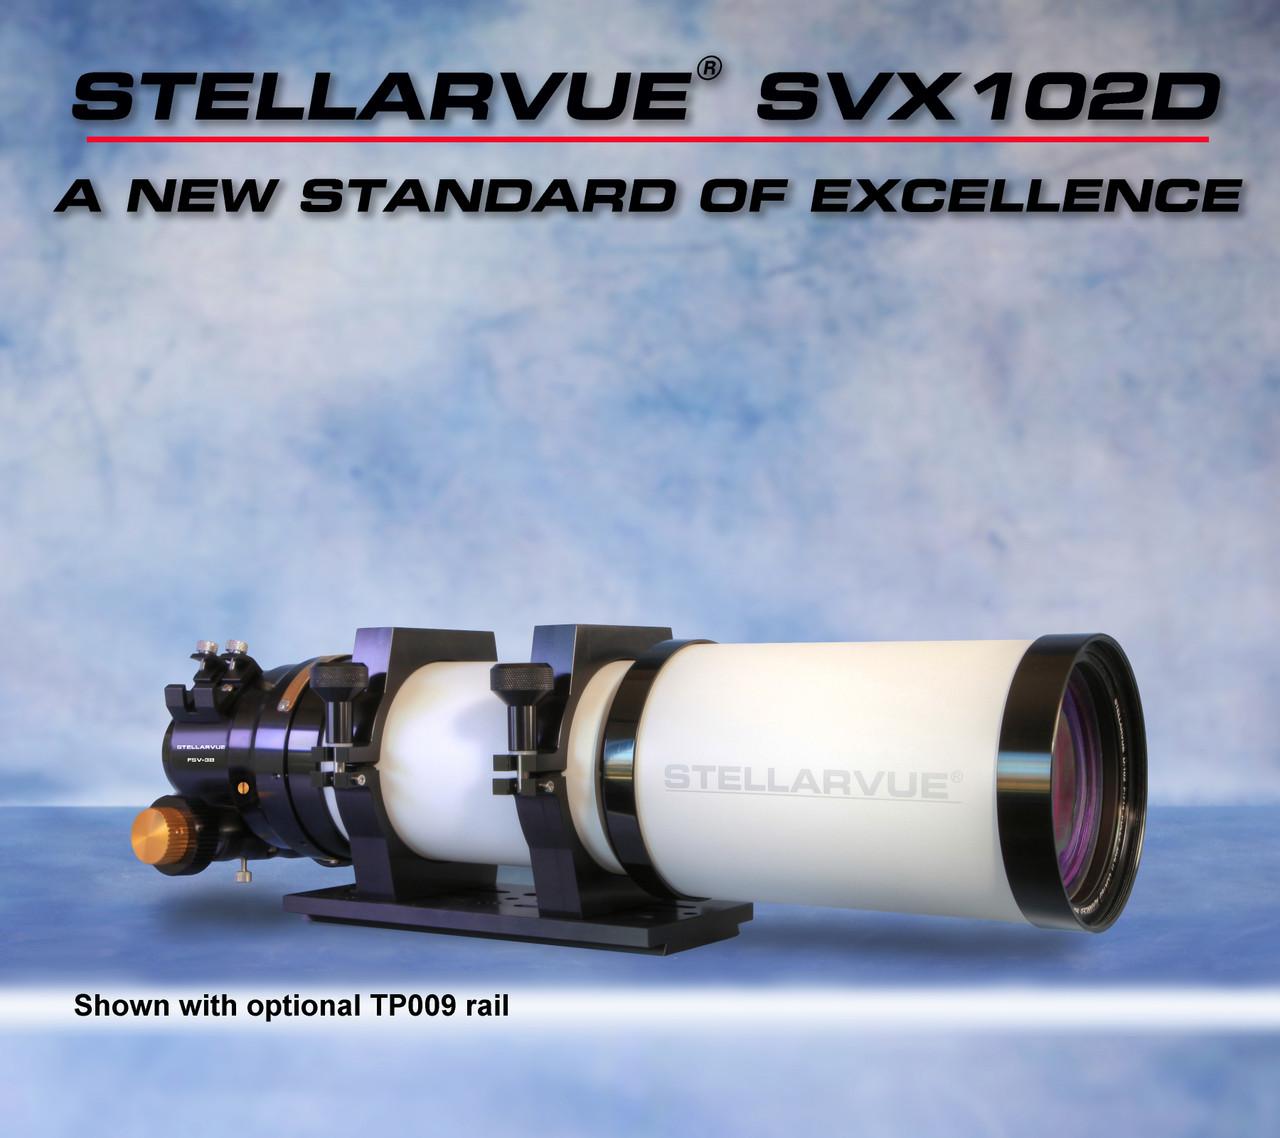 "Stellarvue's most economical 4"" apo refractor, the SVX102D"